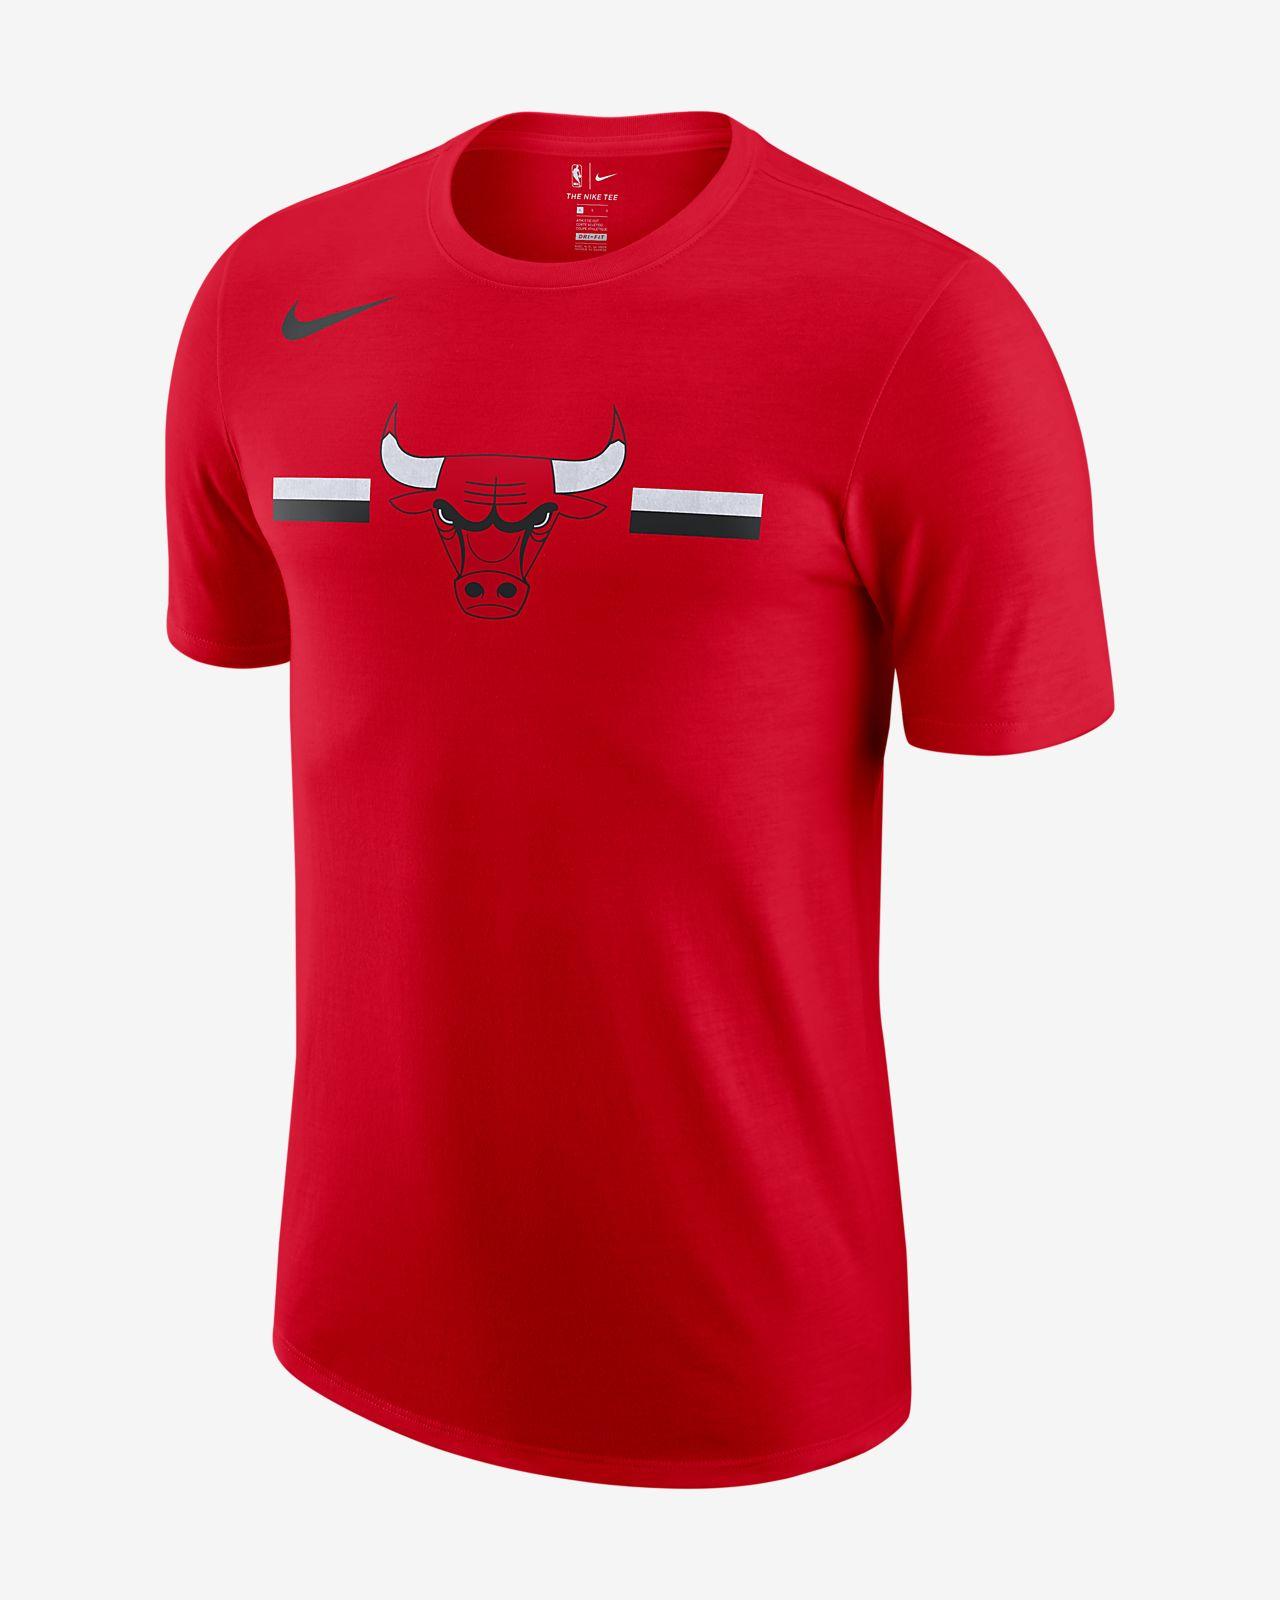 Chicago Homme Pour Be Nike Shirt Bulls Nba Fit Tee Dri qw4S67